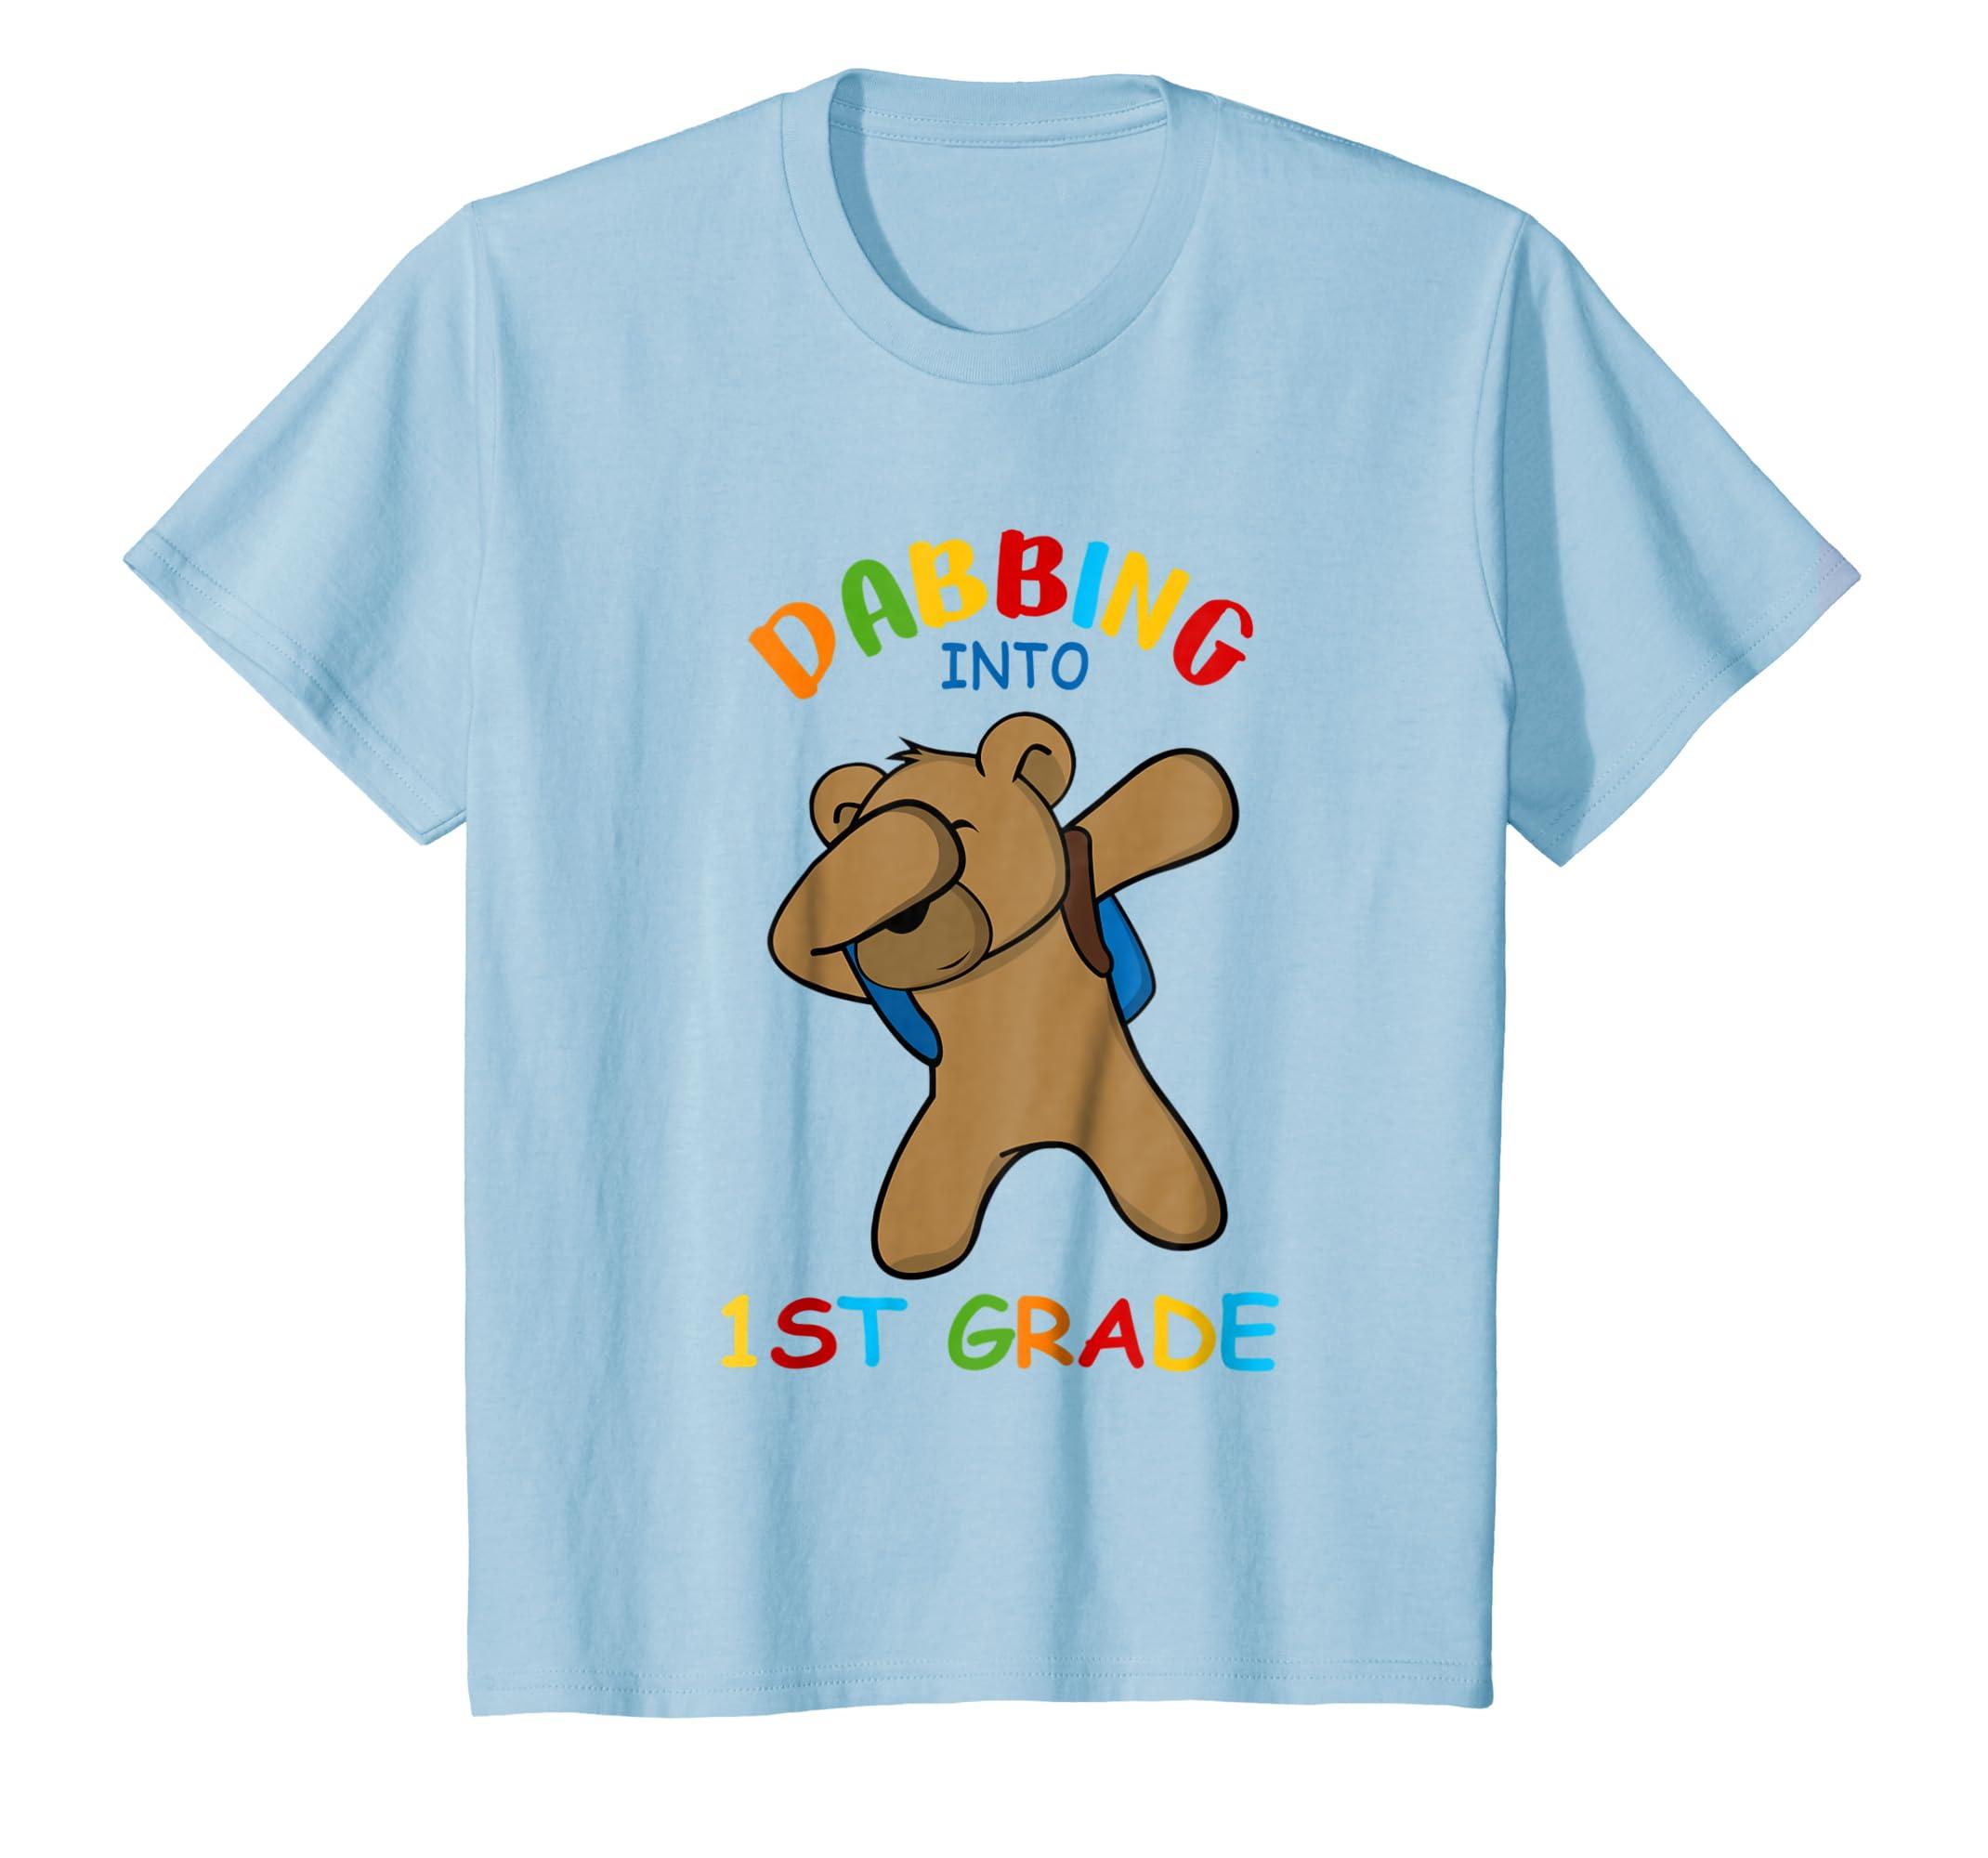 Bear Dabbing Into 1st Grade Shirt For Kids-Awarplus